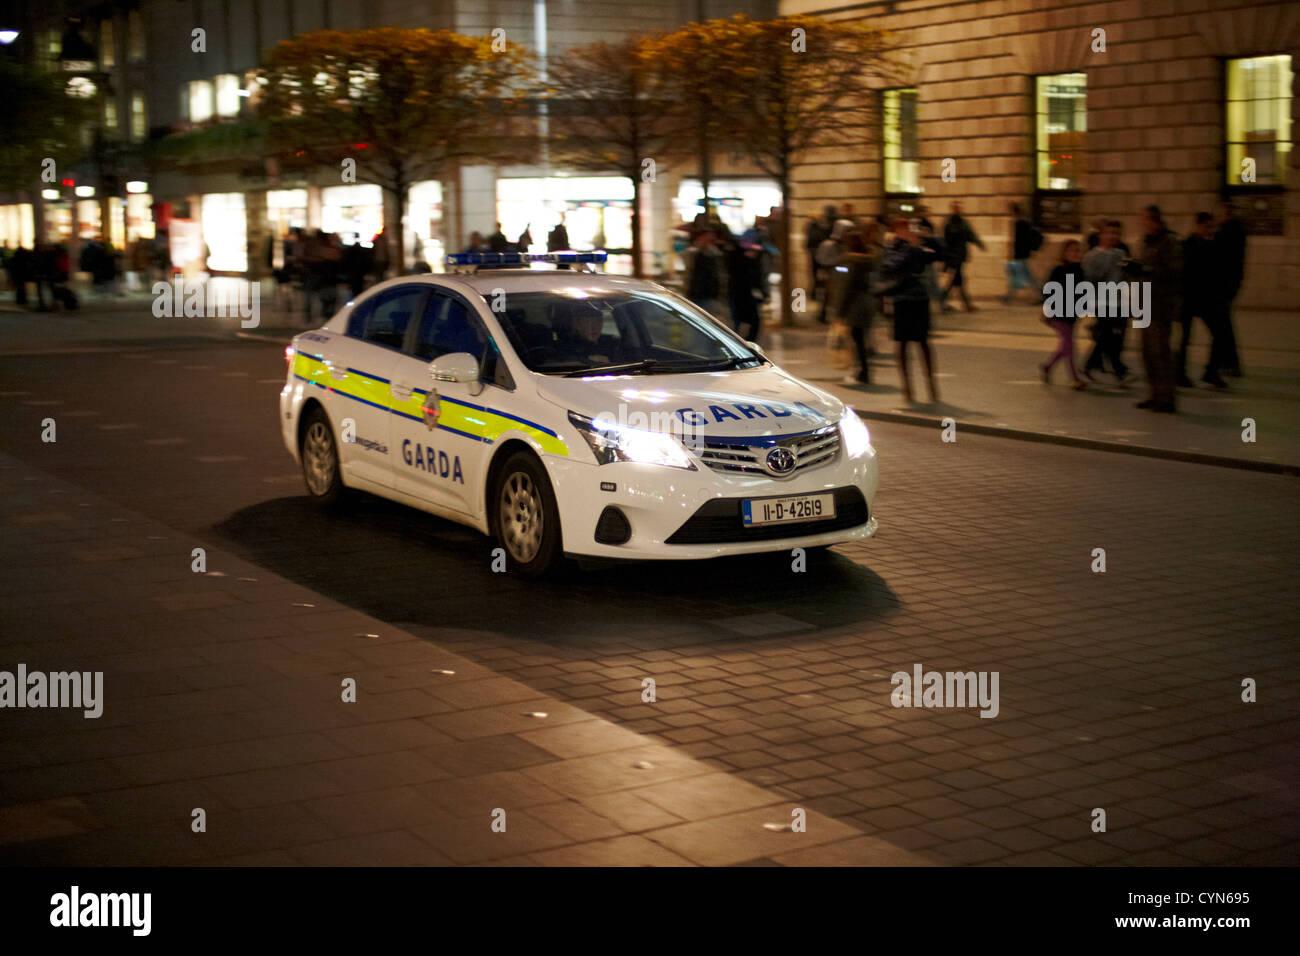 garda siochana patrol car driving along oconnell street at night dublin republic of ireland Stock Photo